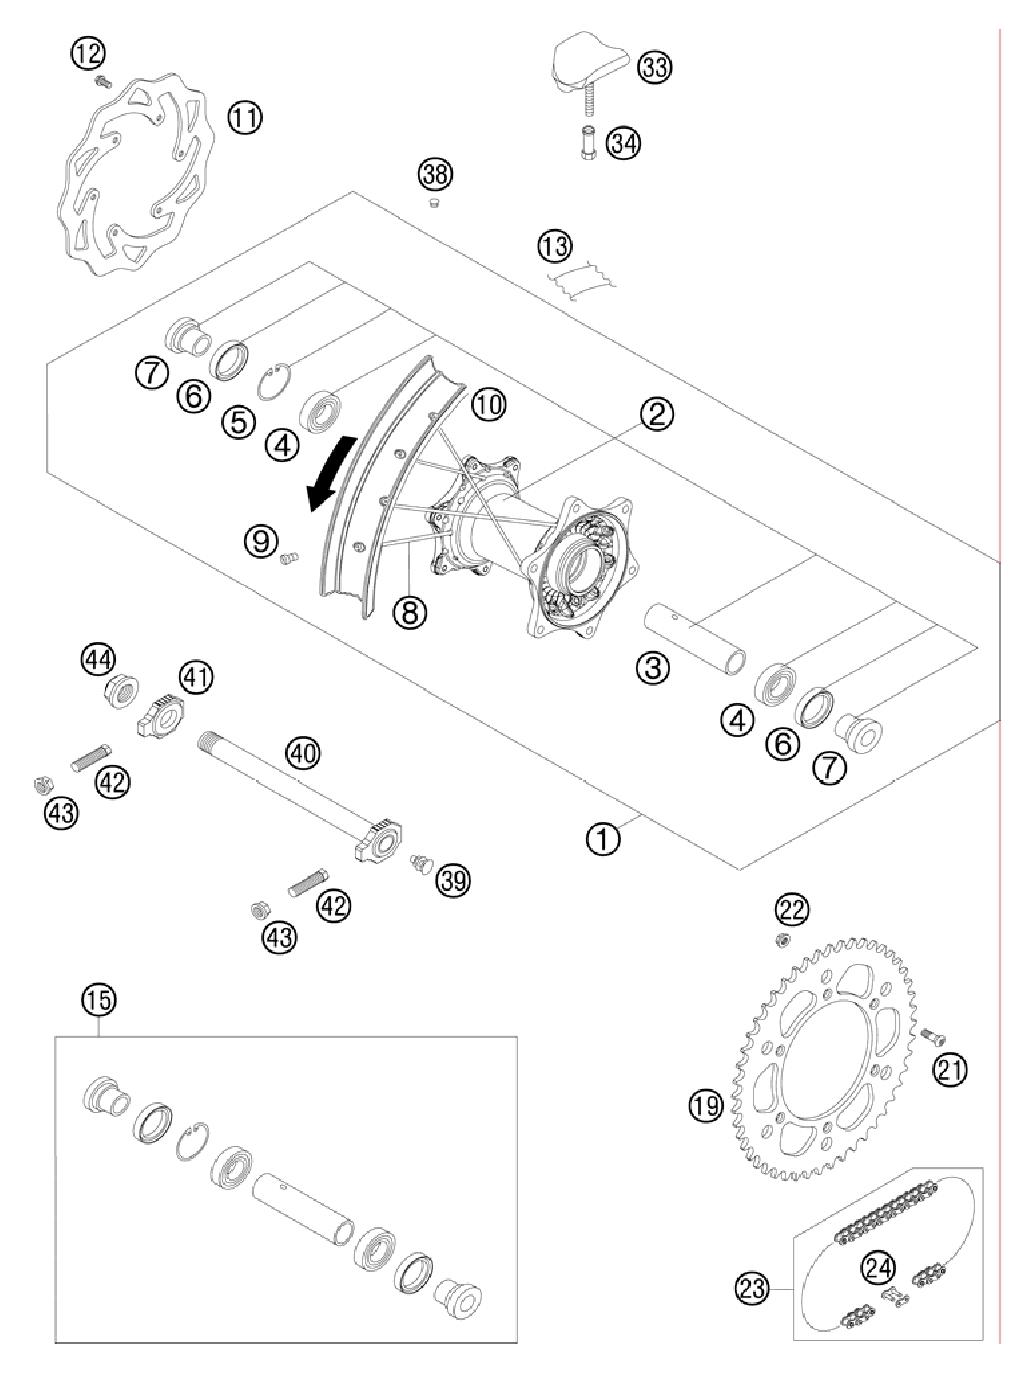 Запчасти на снегоходы ktm 2011 года 450 xc w sd chassis